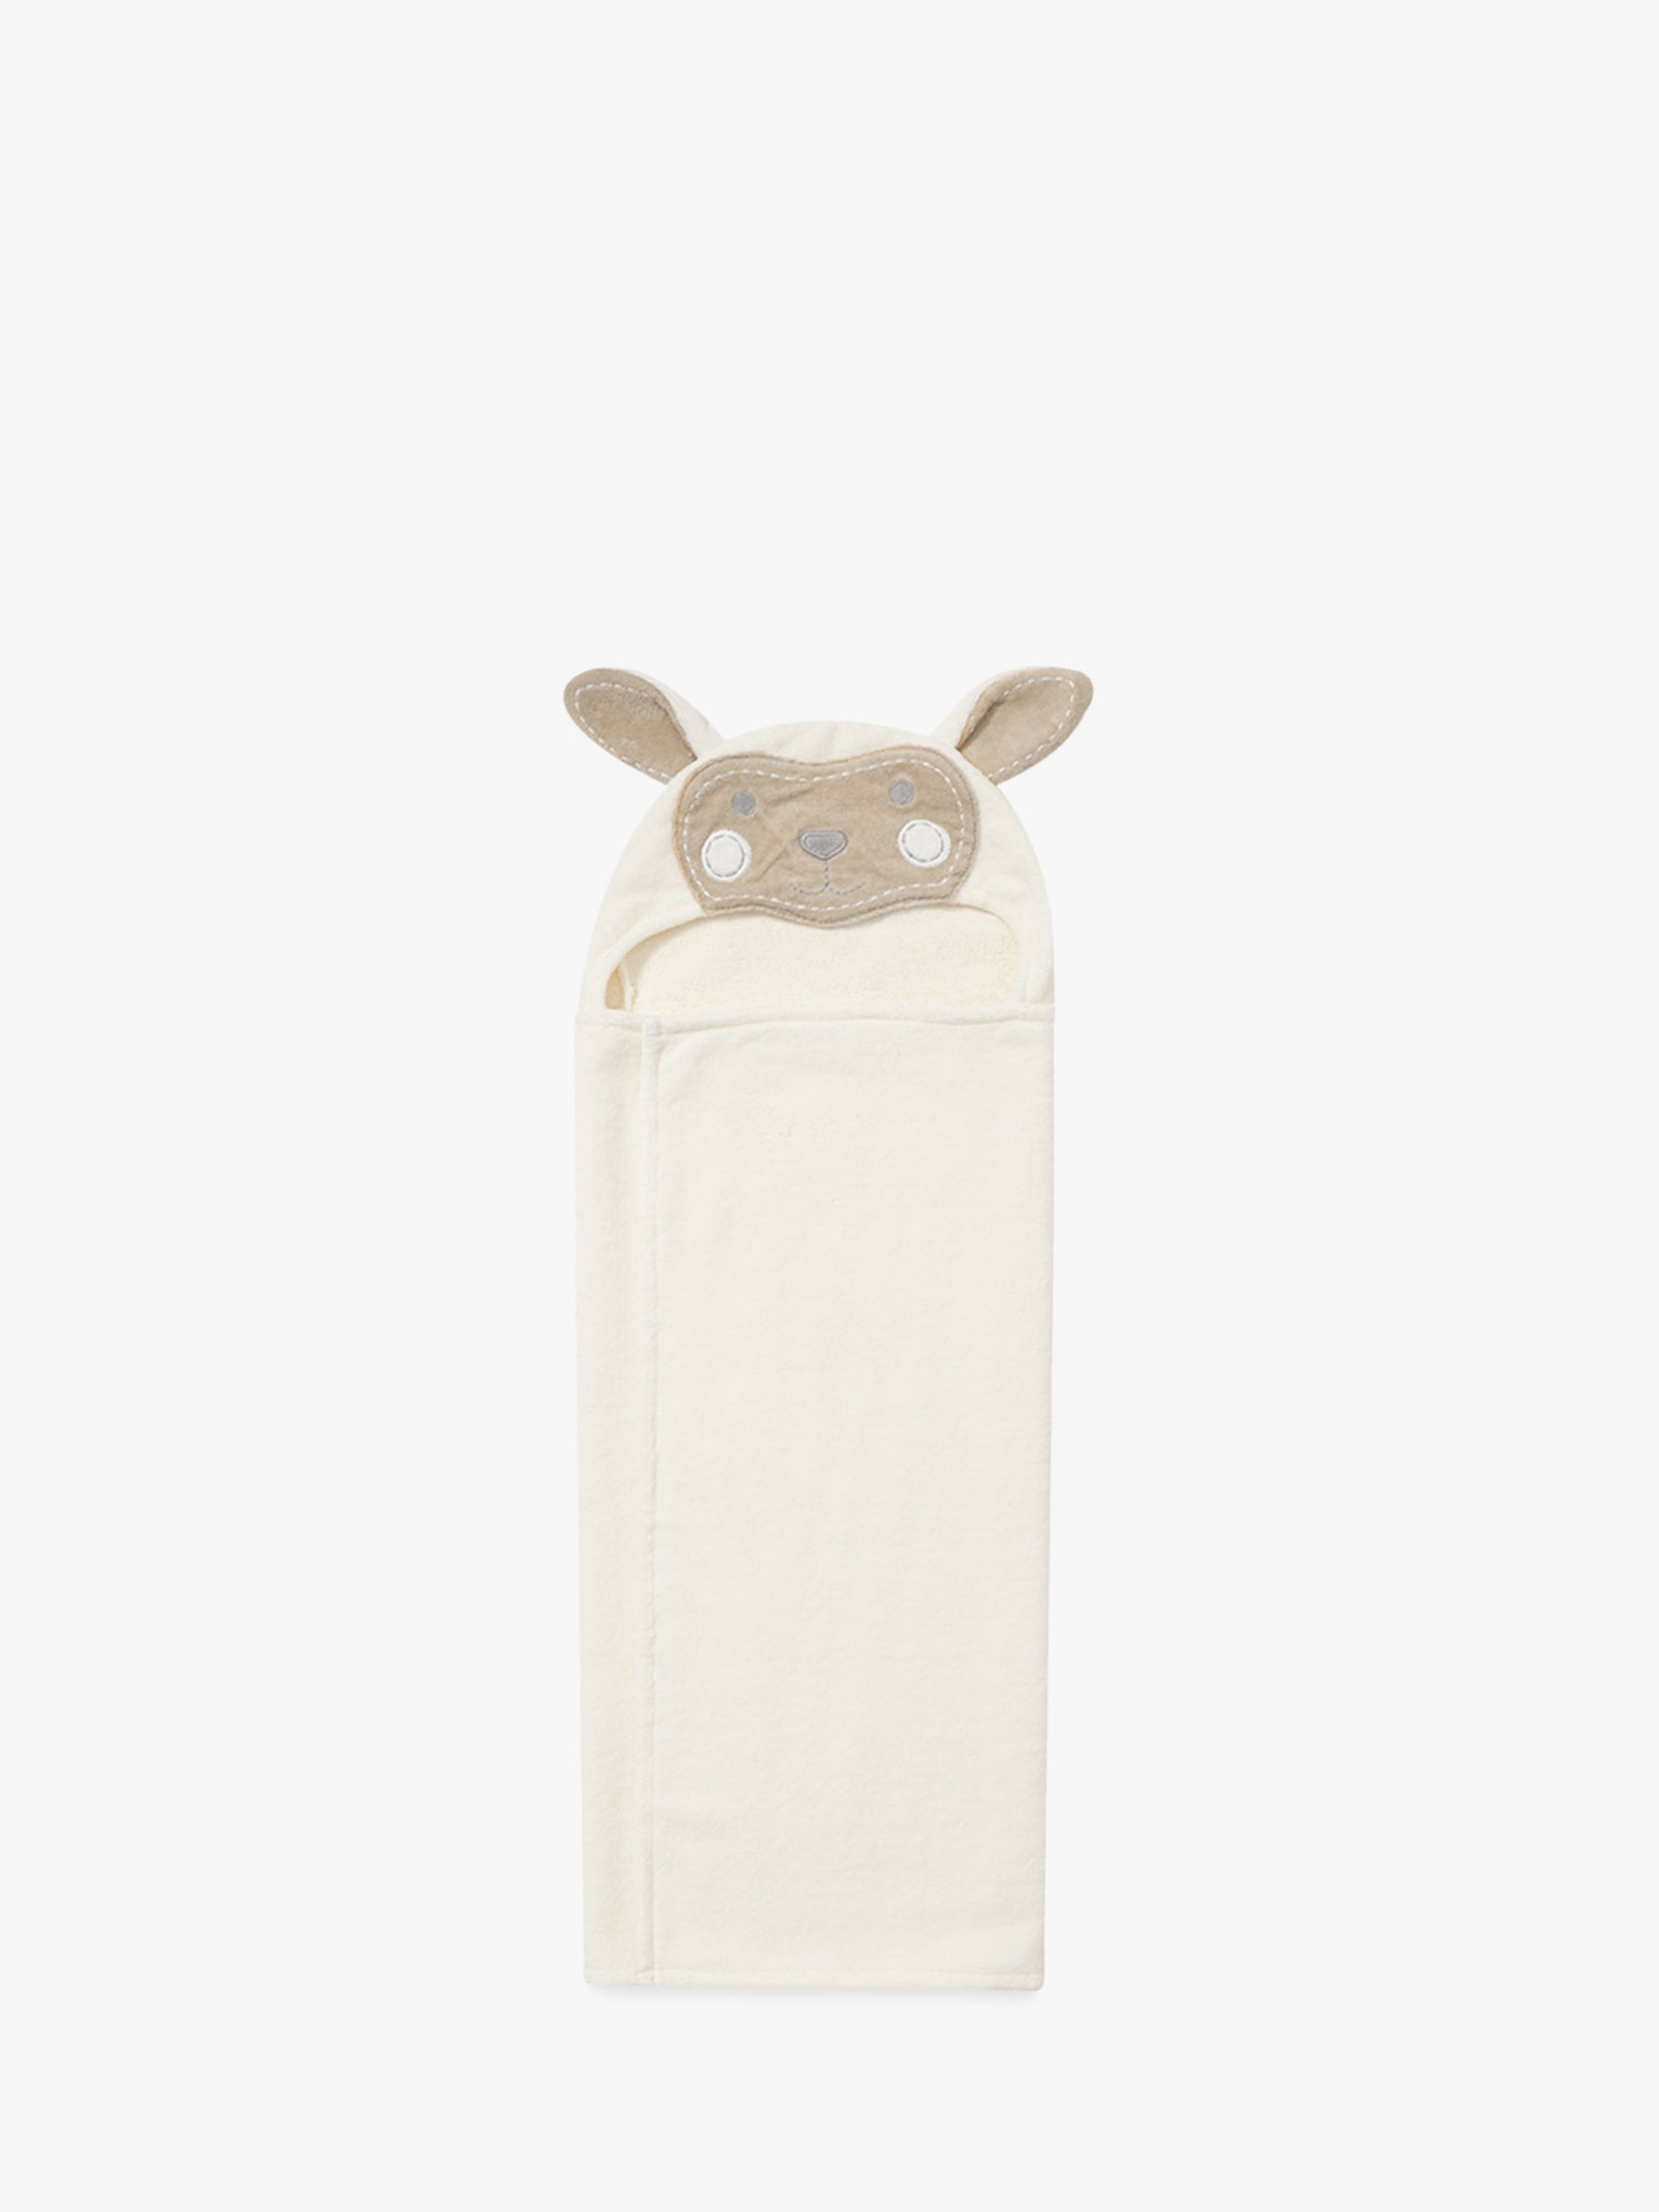 Pottery Barn Kids Lamb Critter Hooded Bath Towel